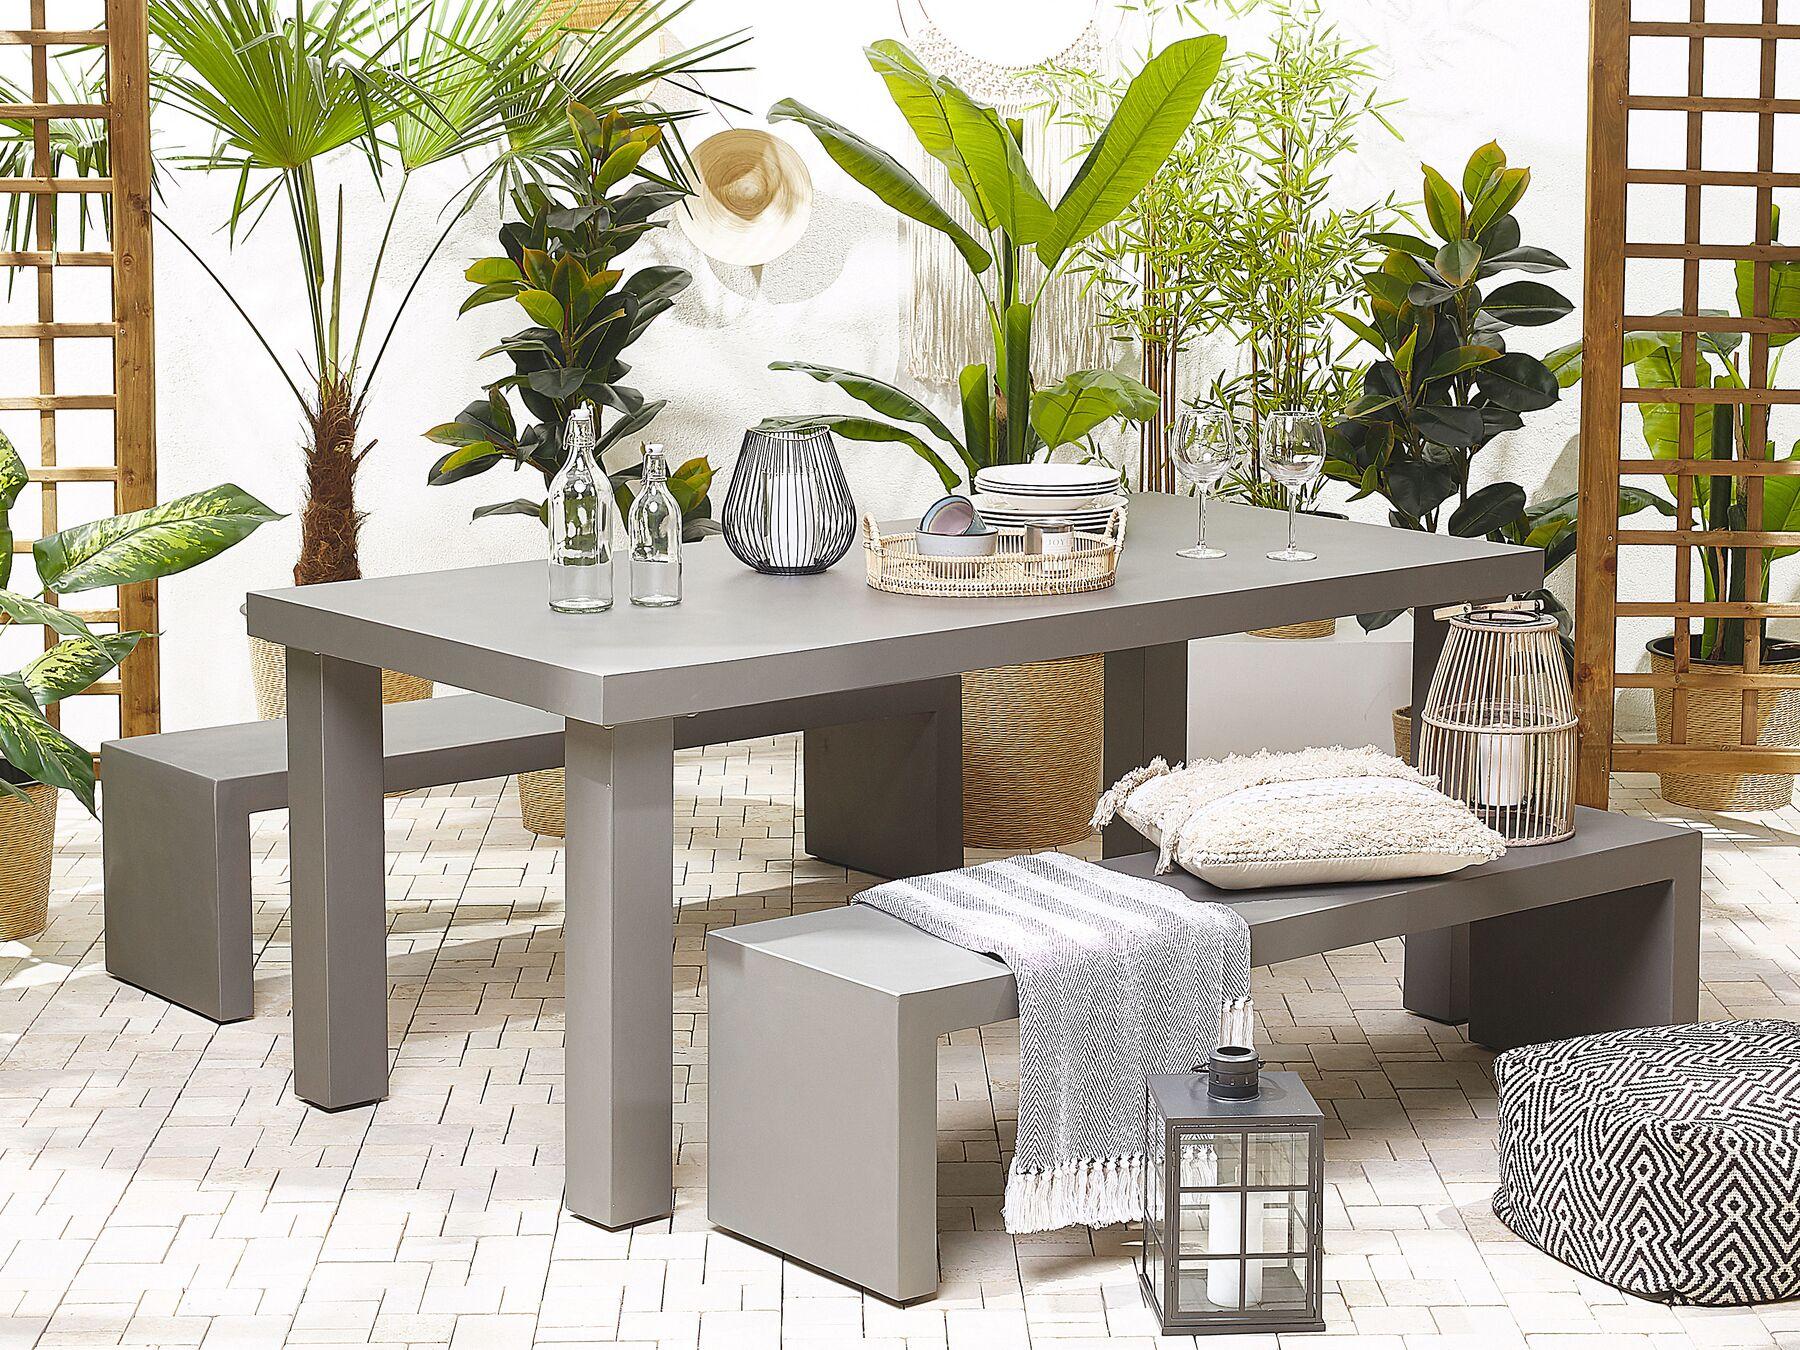 Belaini 4 Seater Concrete Garden Furniture